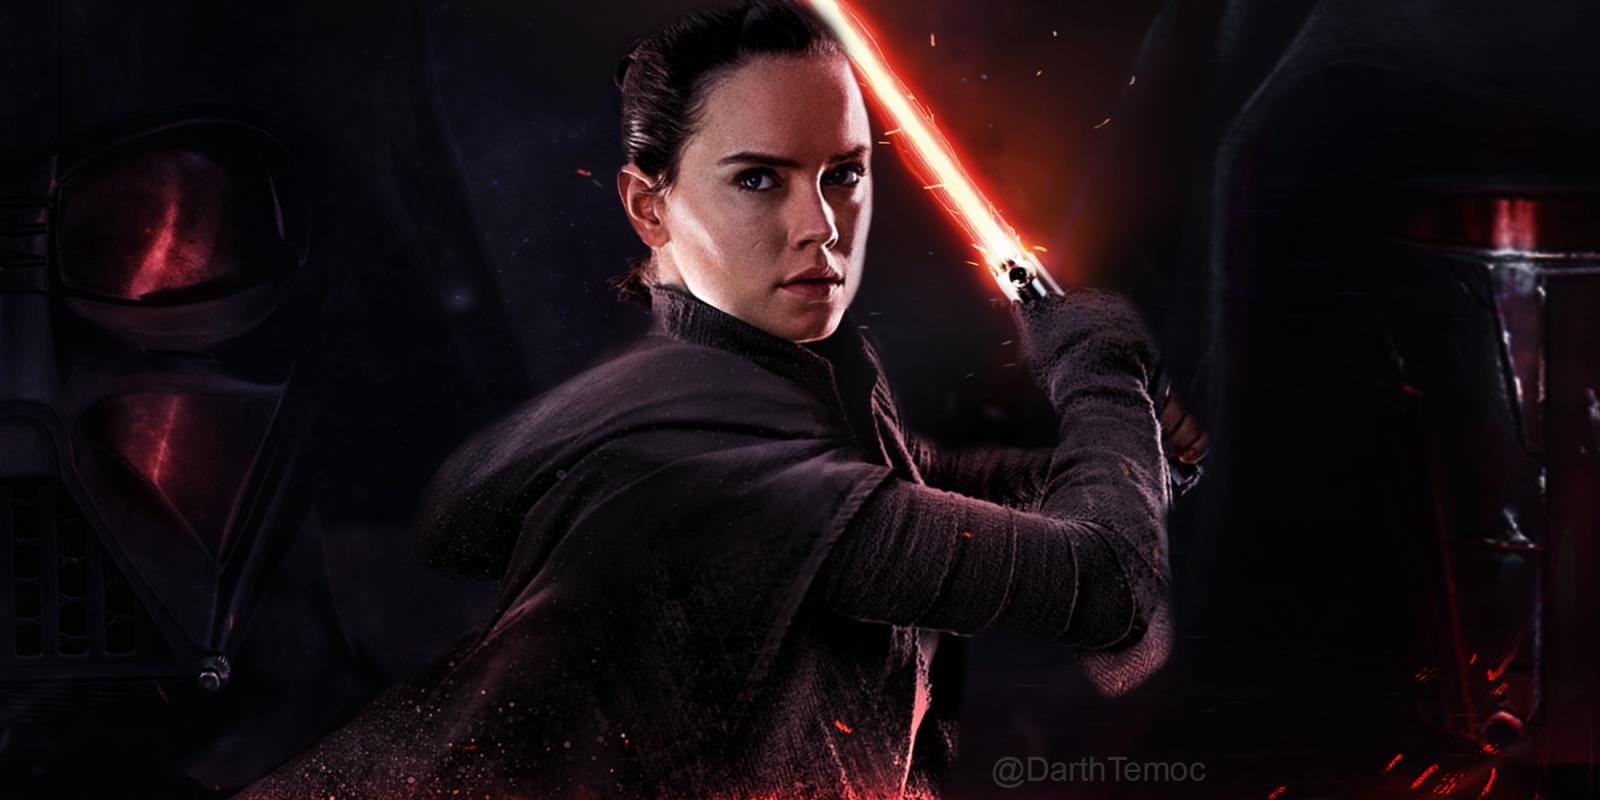 Wallpaper Star Wars The Last Jedi Rey From Star Wars Daisy